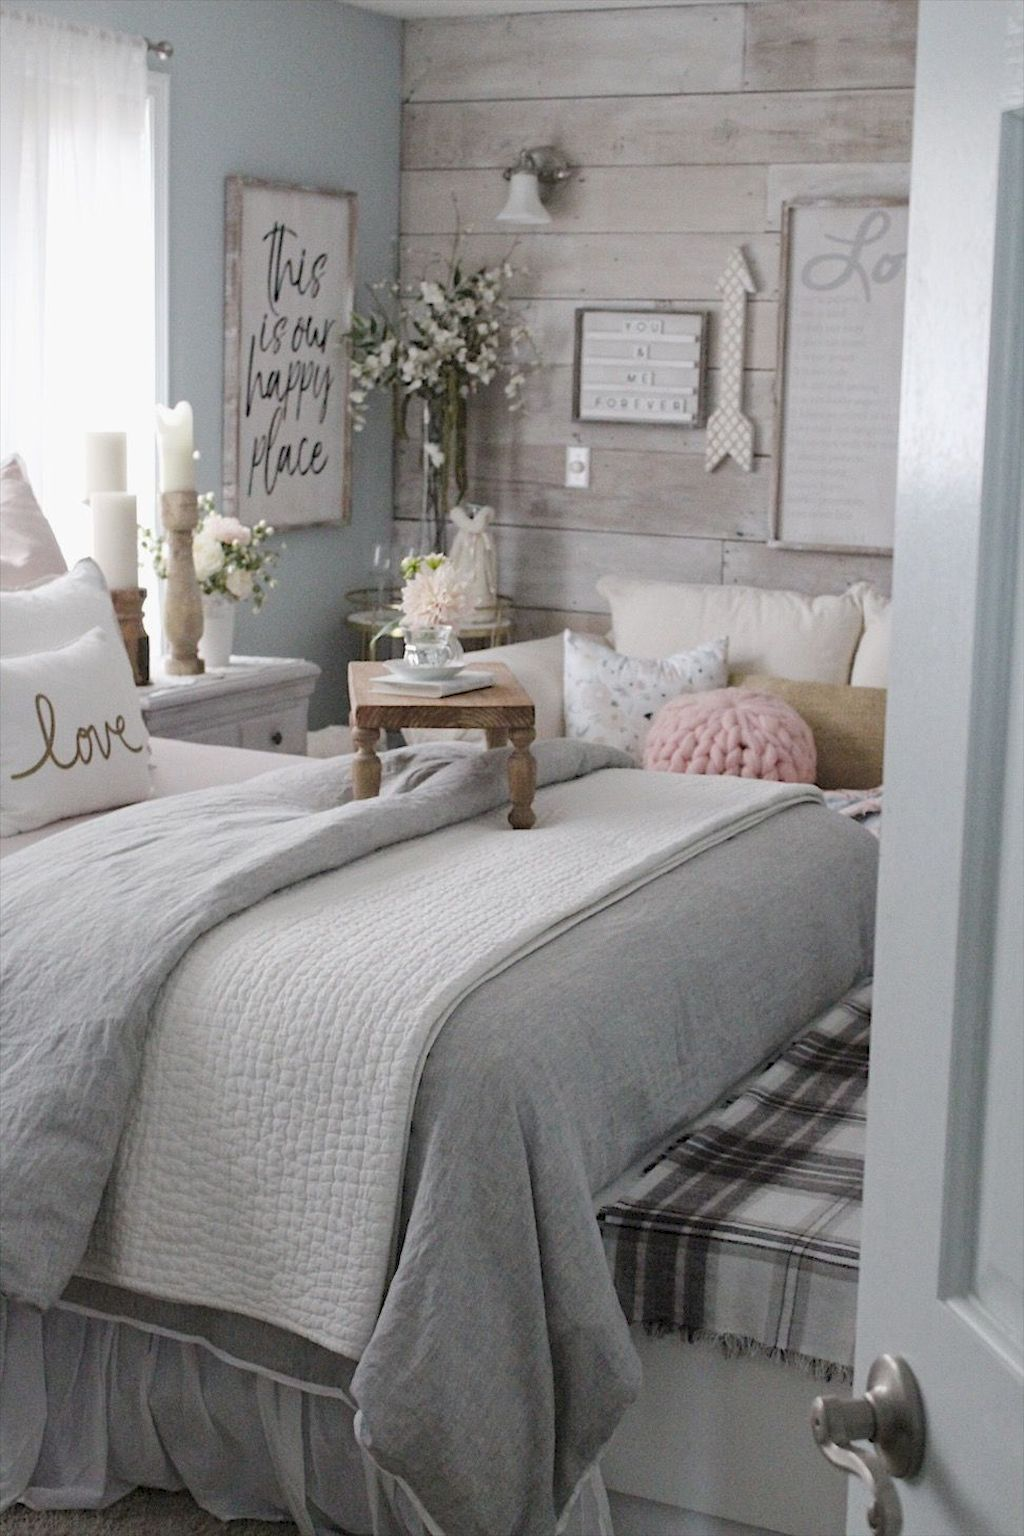 52 Popular Diy Small Master Bedroom Ideas For Inspirations On A Budget Decoona Remodel Bedroom Master Bedrooms Decor Small Master Bedroom